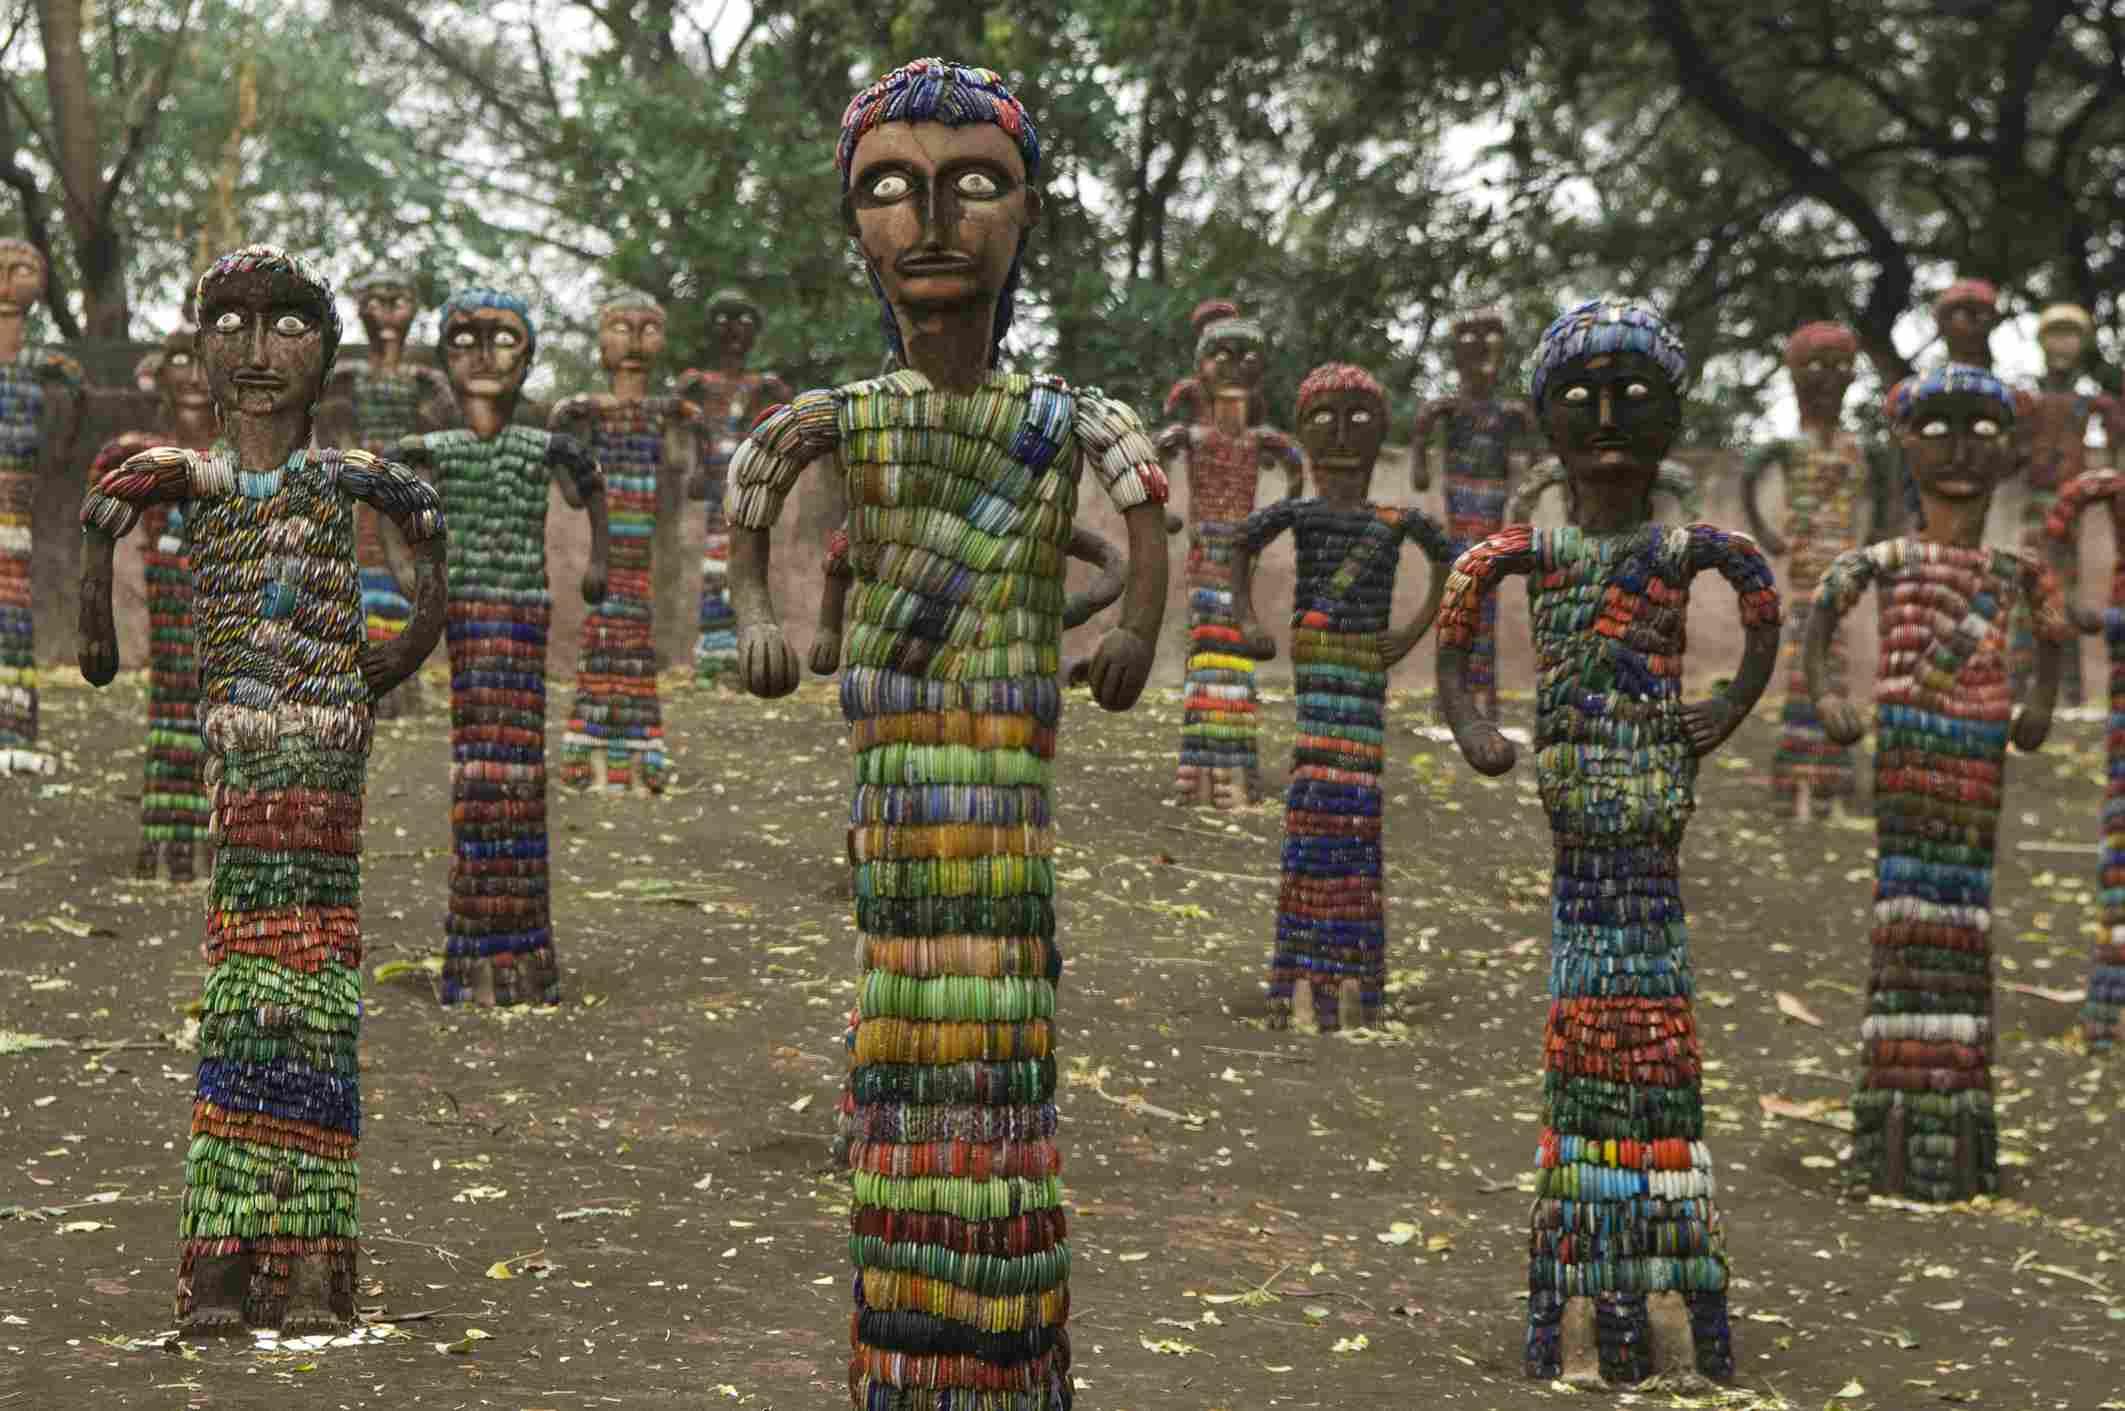 Statues in Nek Chand's Rock Garden, Chandigarh.